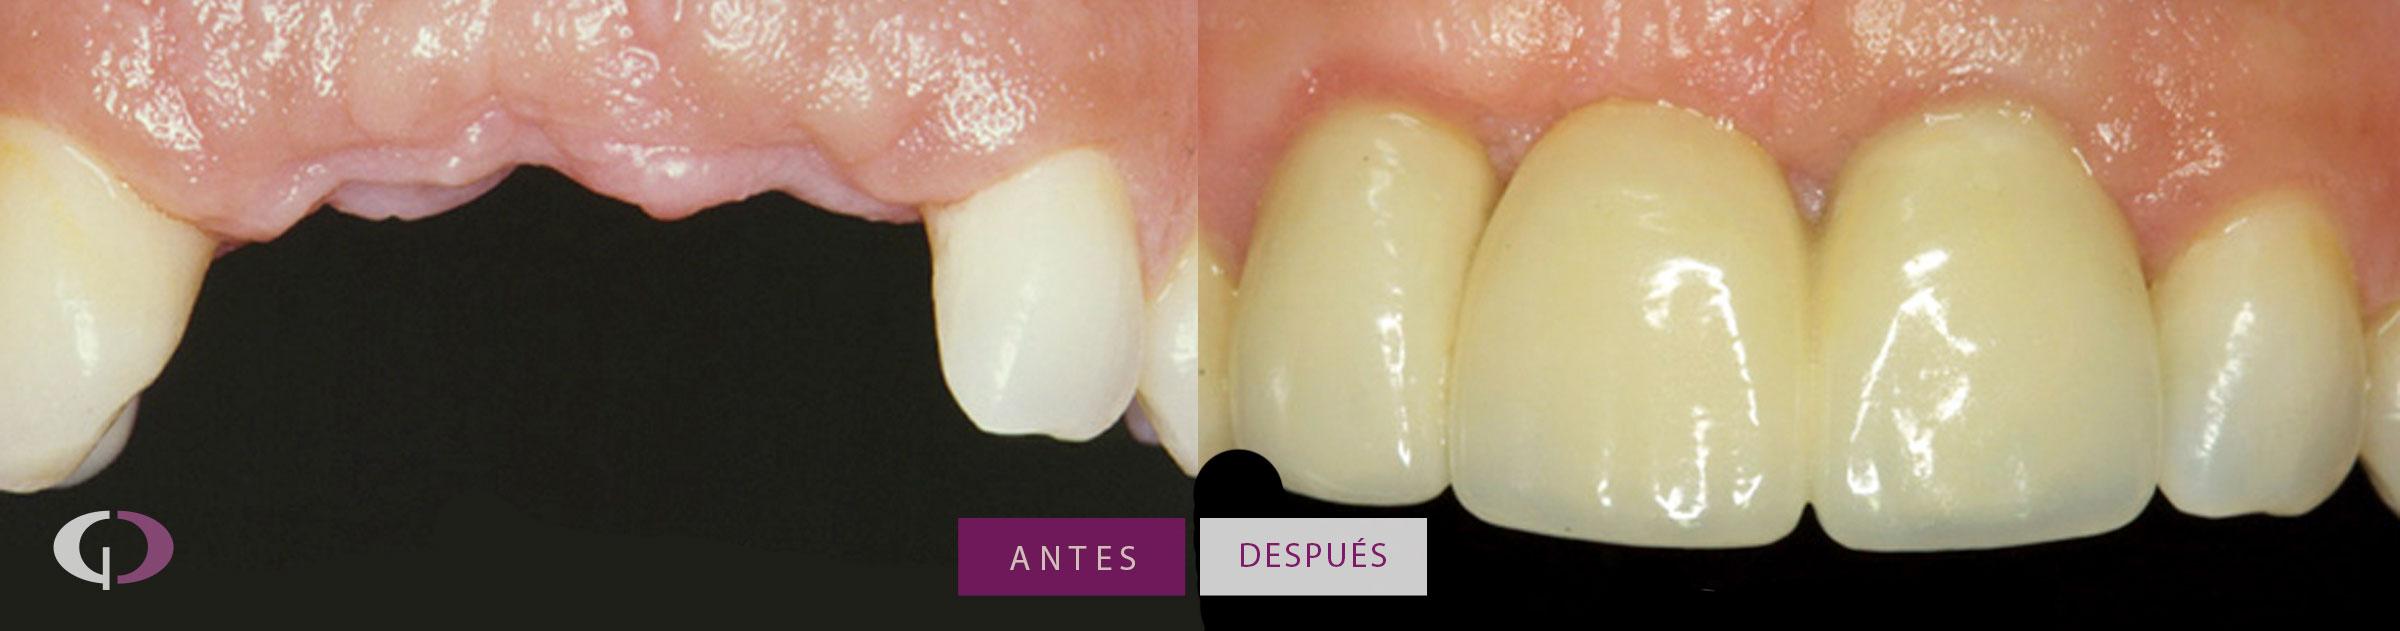 Caso Clínico Implantes Dentales